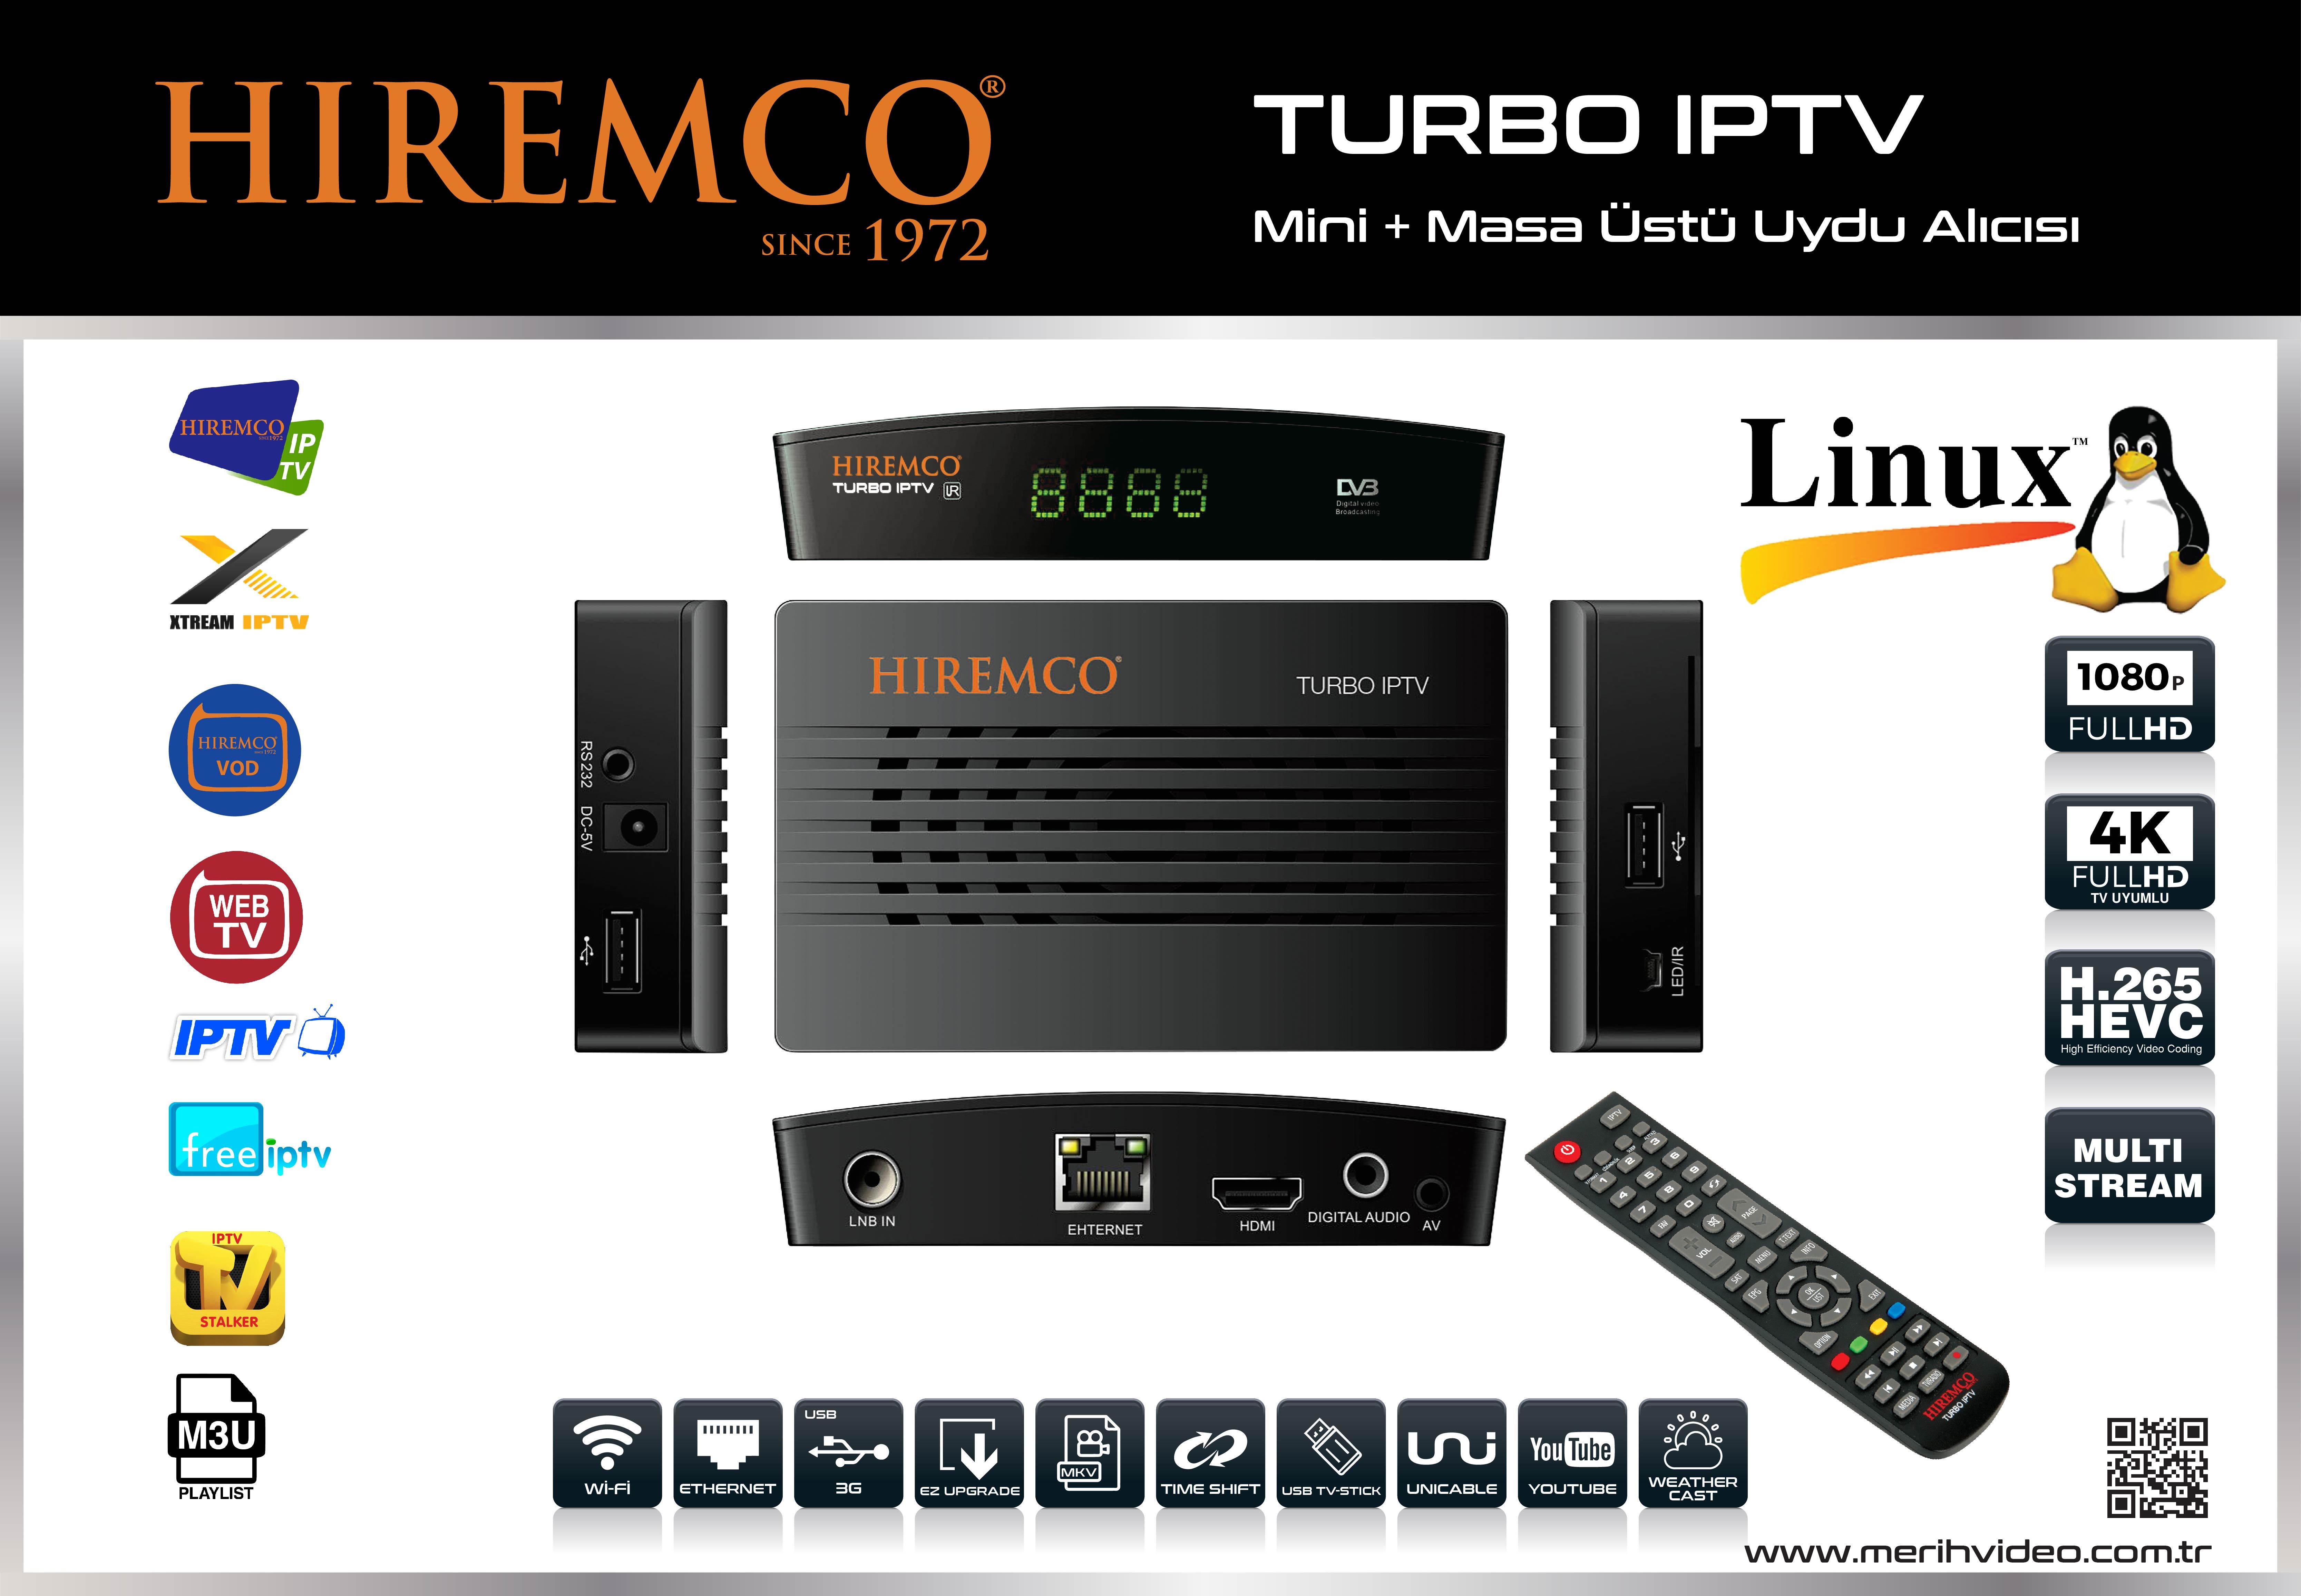 Hiremco Turbo iptv